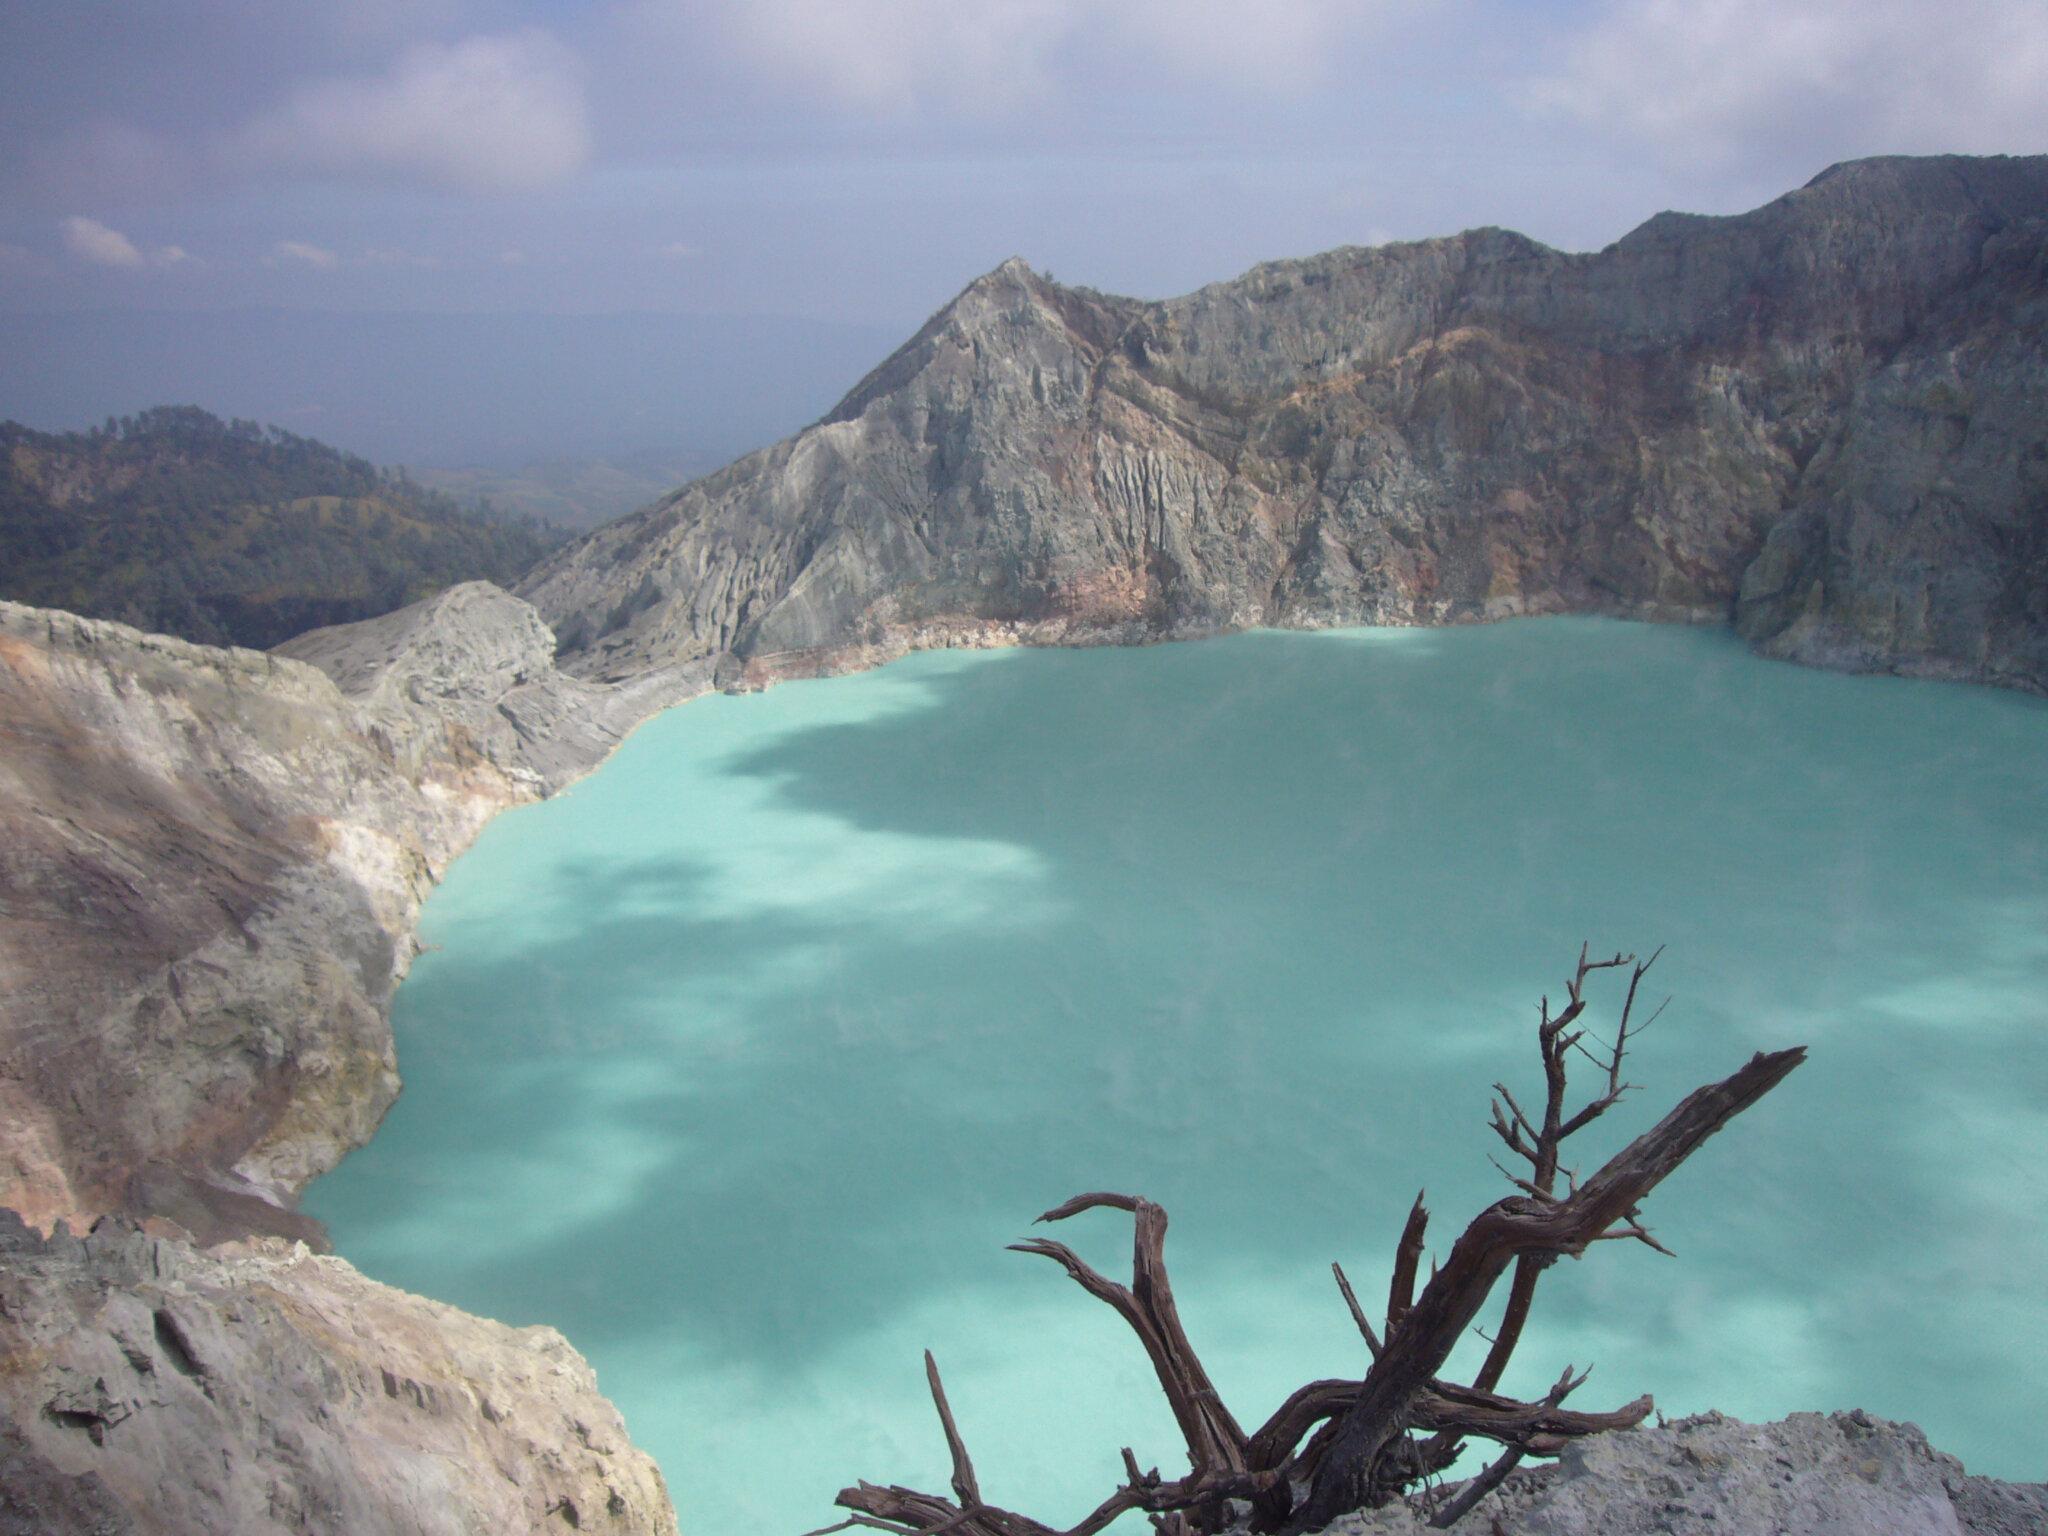 Indonesie : Kawah ijen 2009